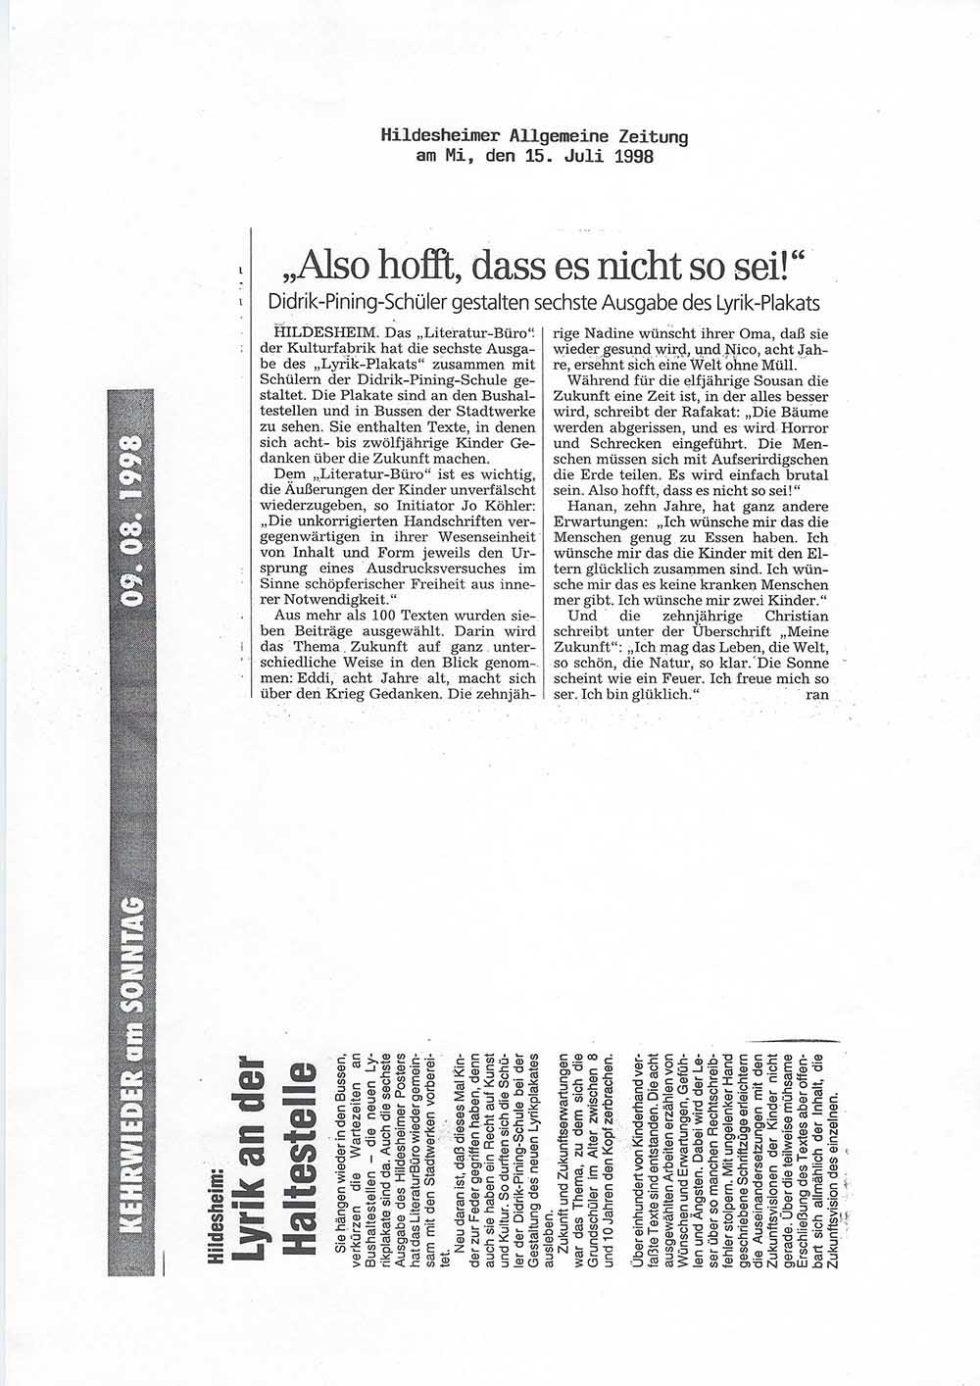 HAZ_Schulprojekte1998_15.07.98